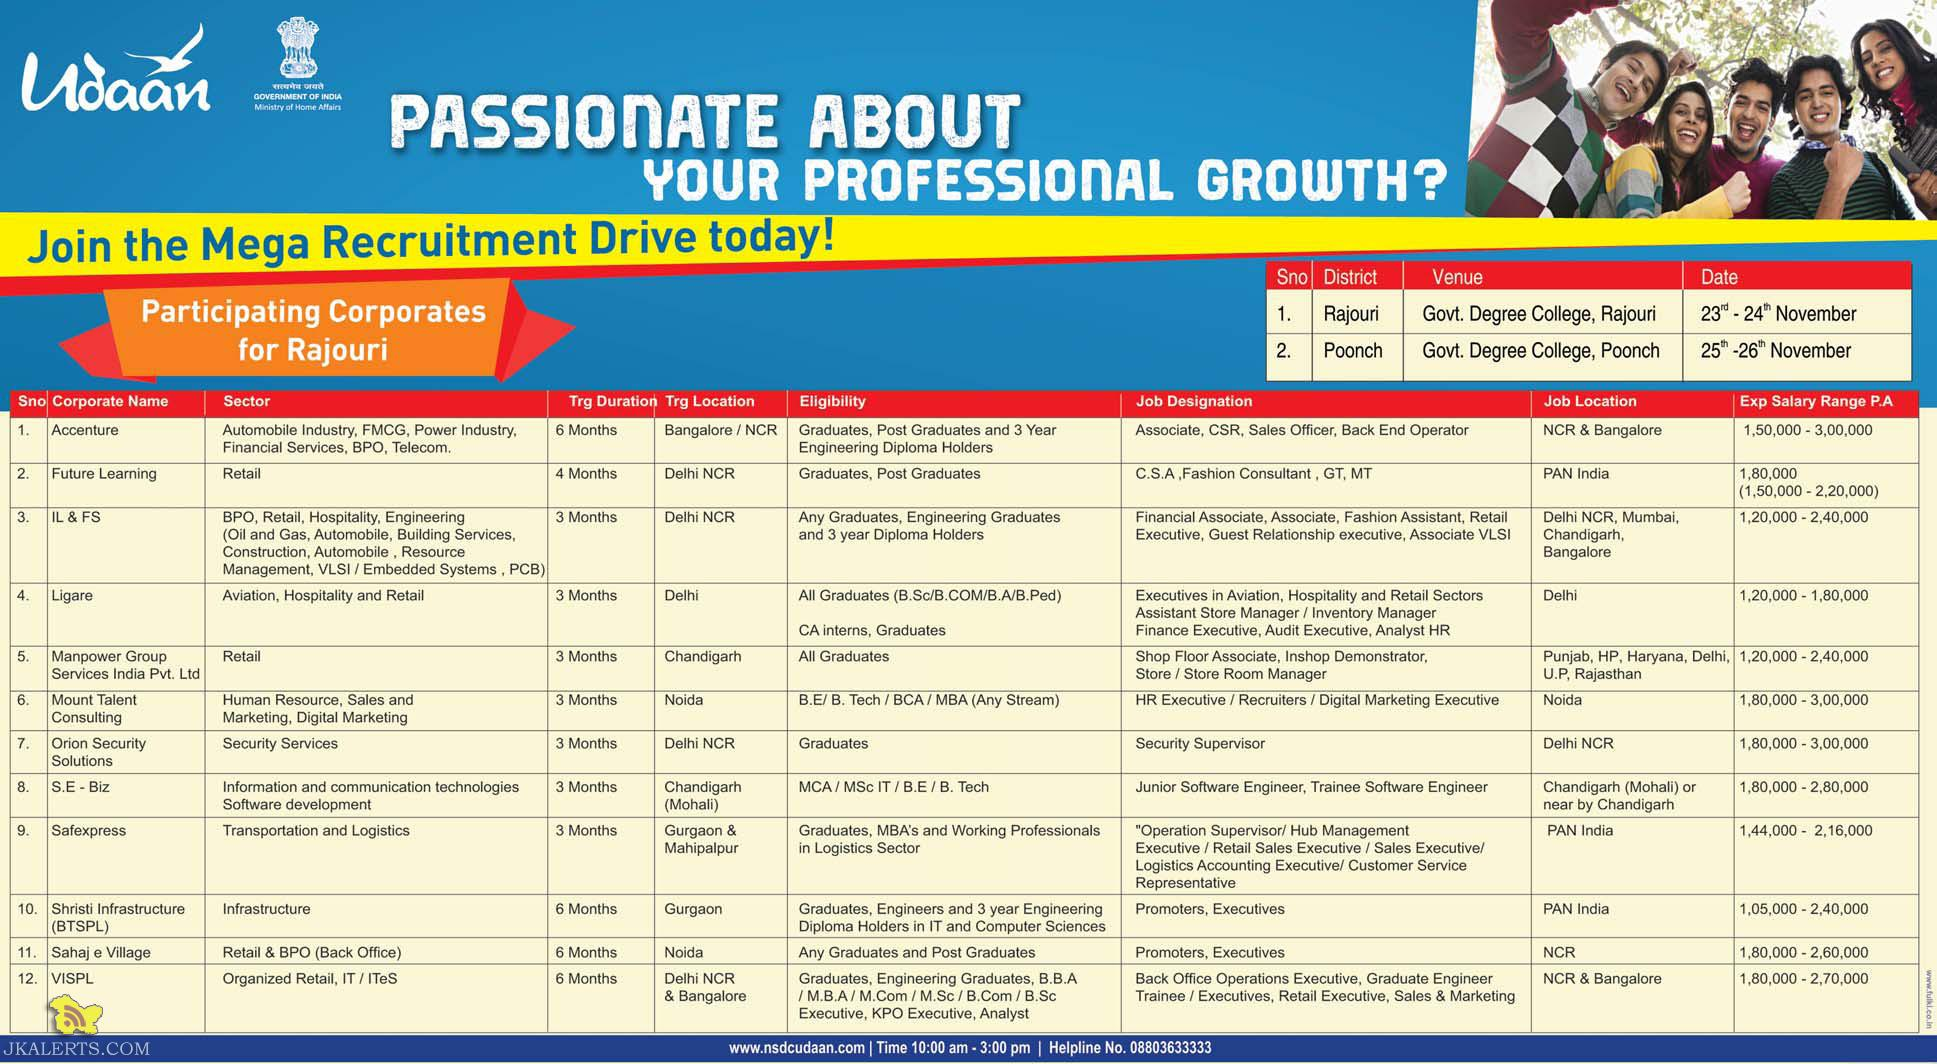 Udaan Mega Recruitment Drive Rajouri Poonch